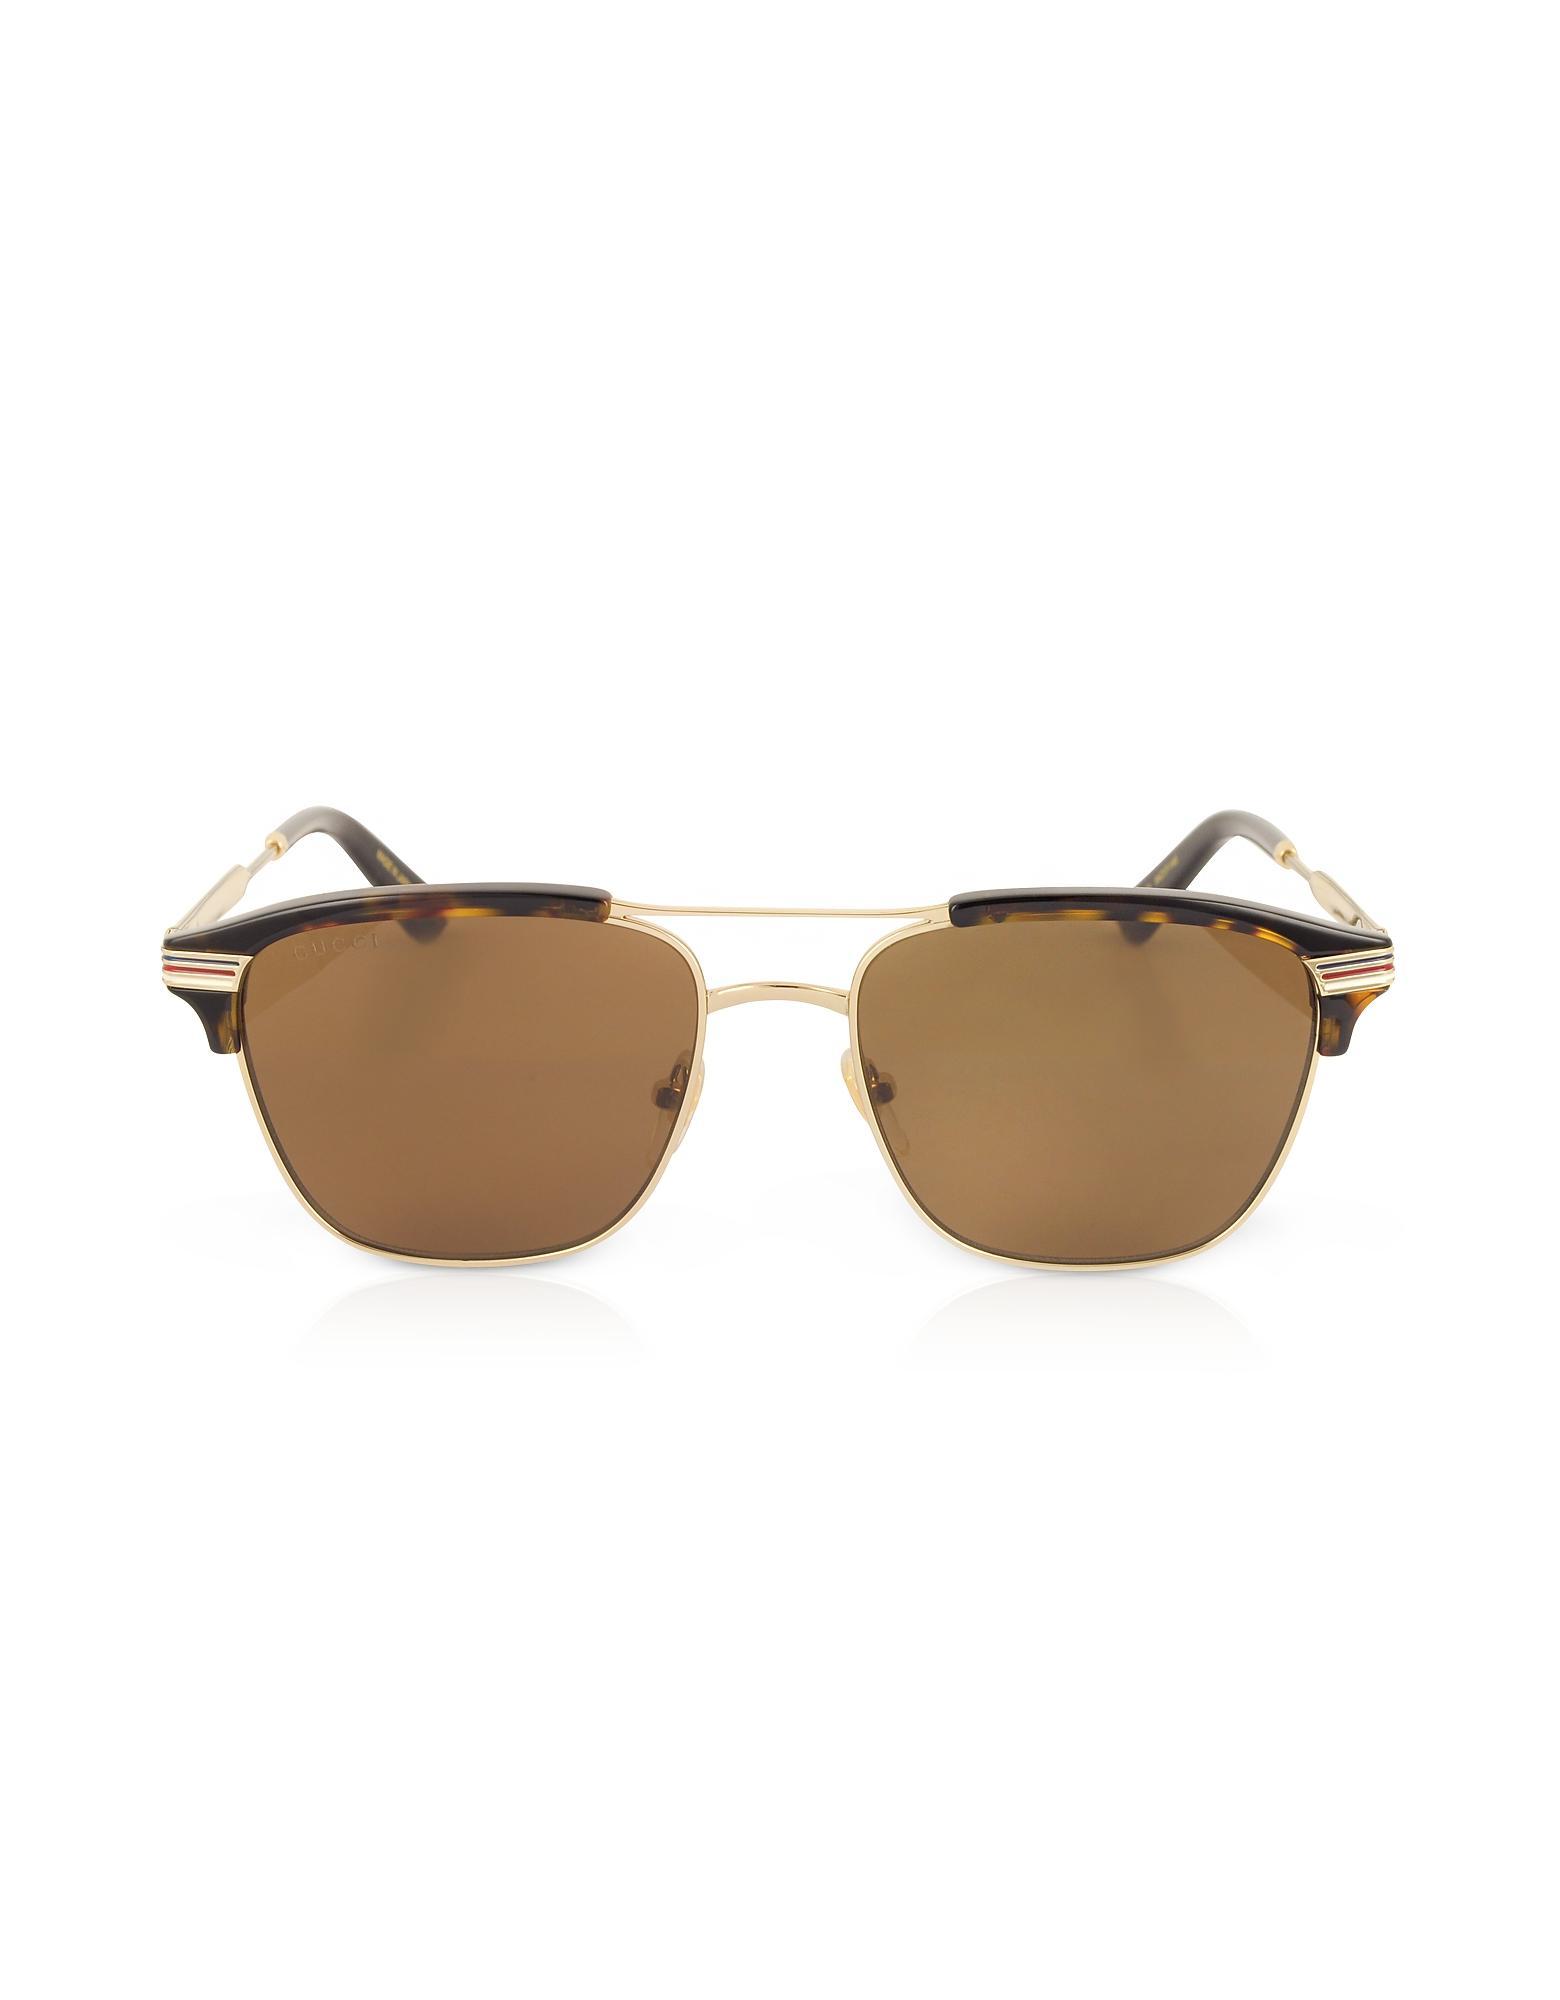 95ede6a3e74 Gucci Gg0241S 002 Square-Frame Metal Sunglasses In Havana Brown ...